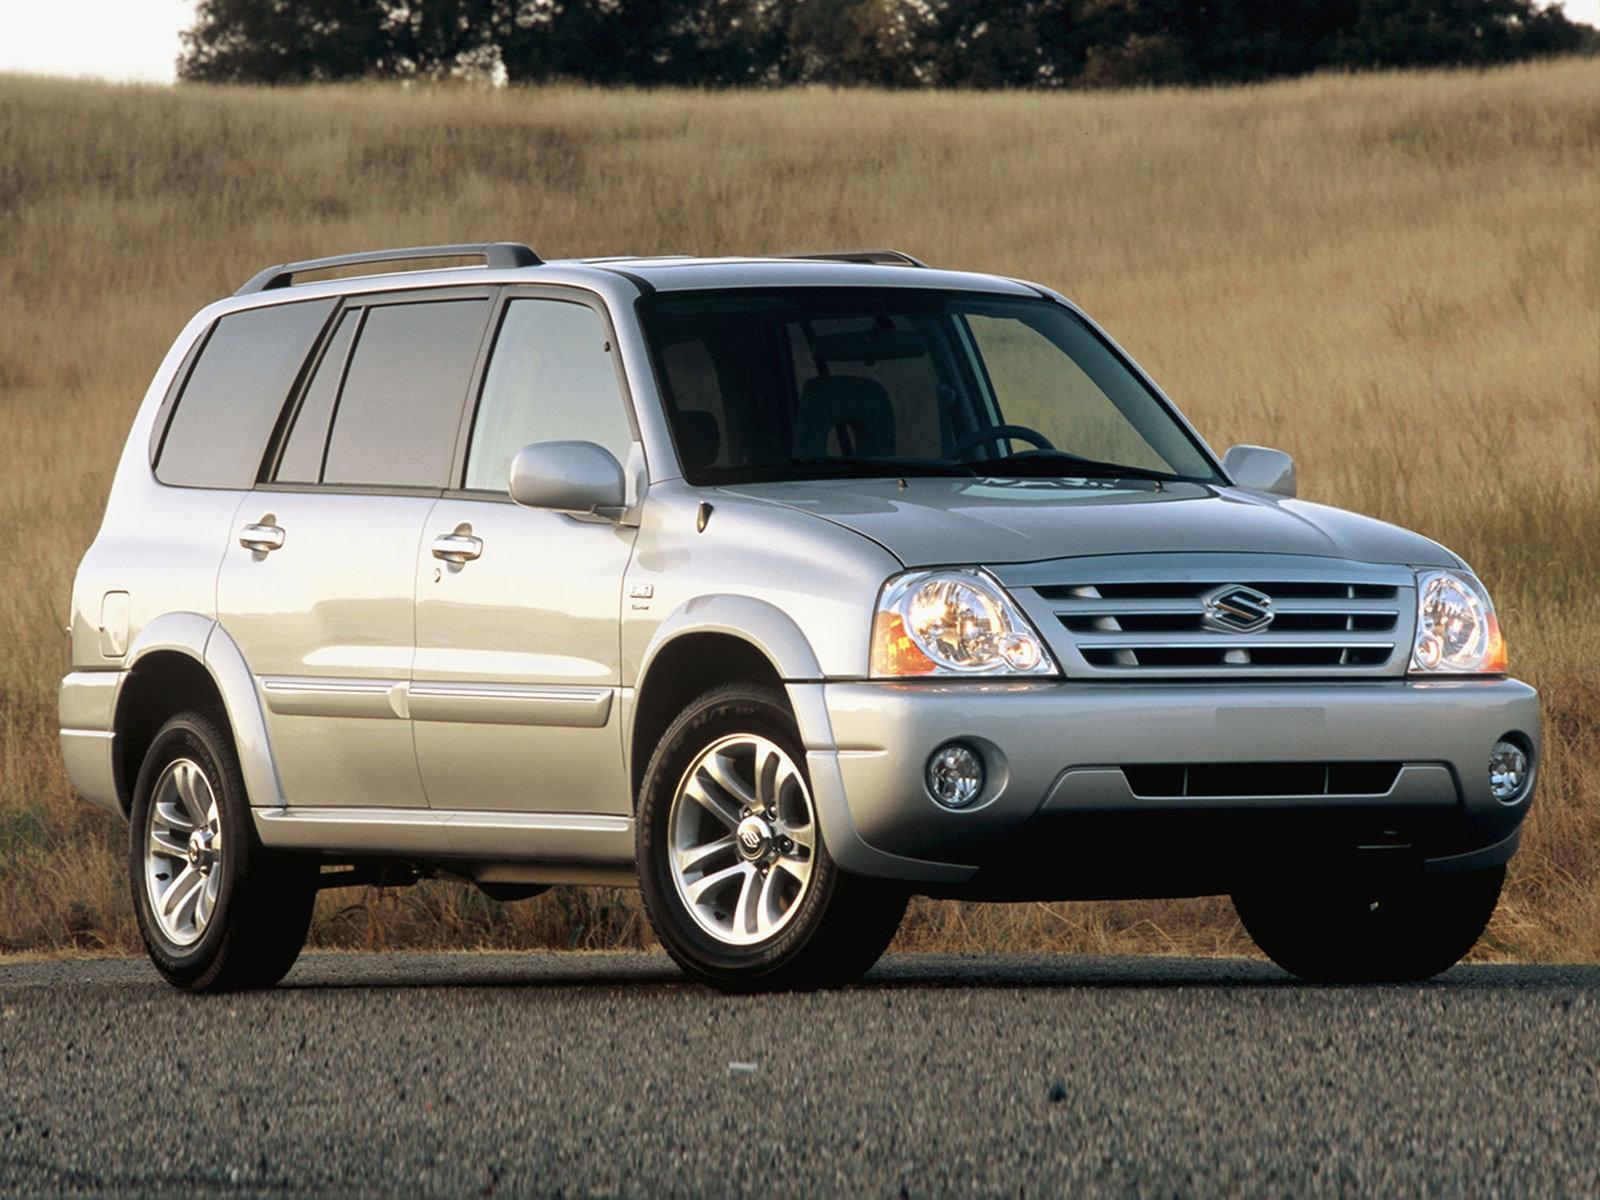 Suzuki (Сузуки) Grand Vitara XL-7 2004-2006 г.